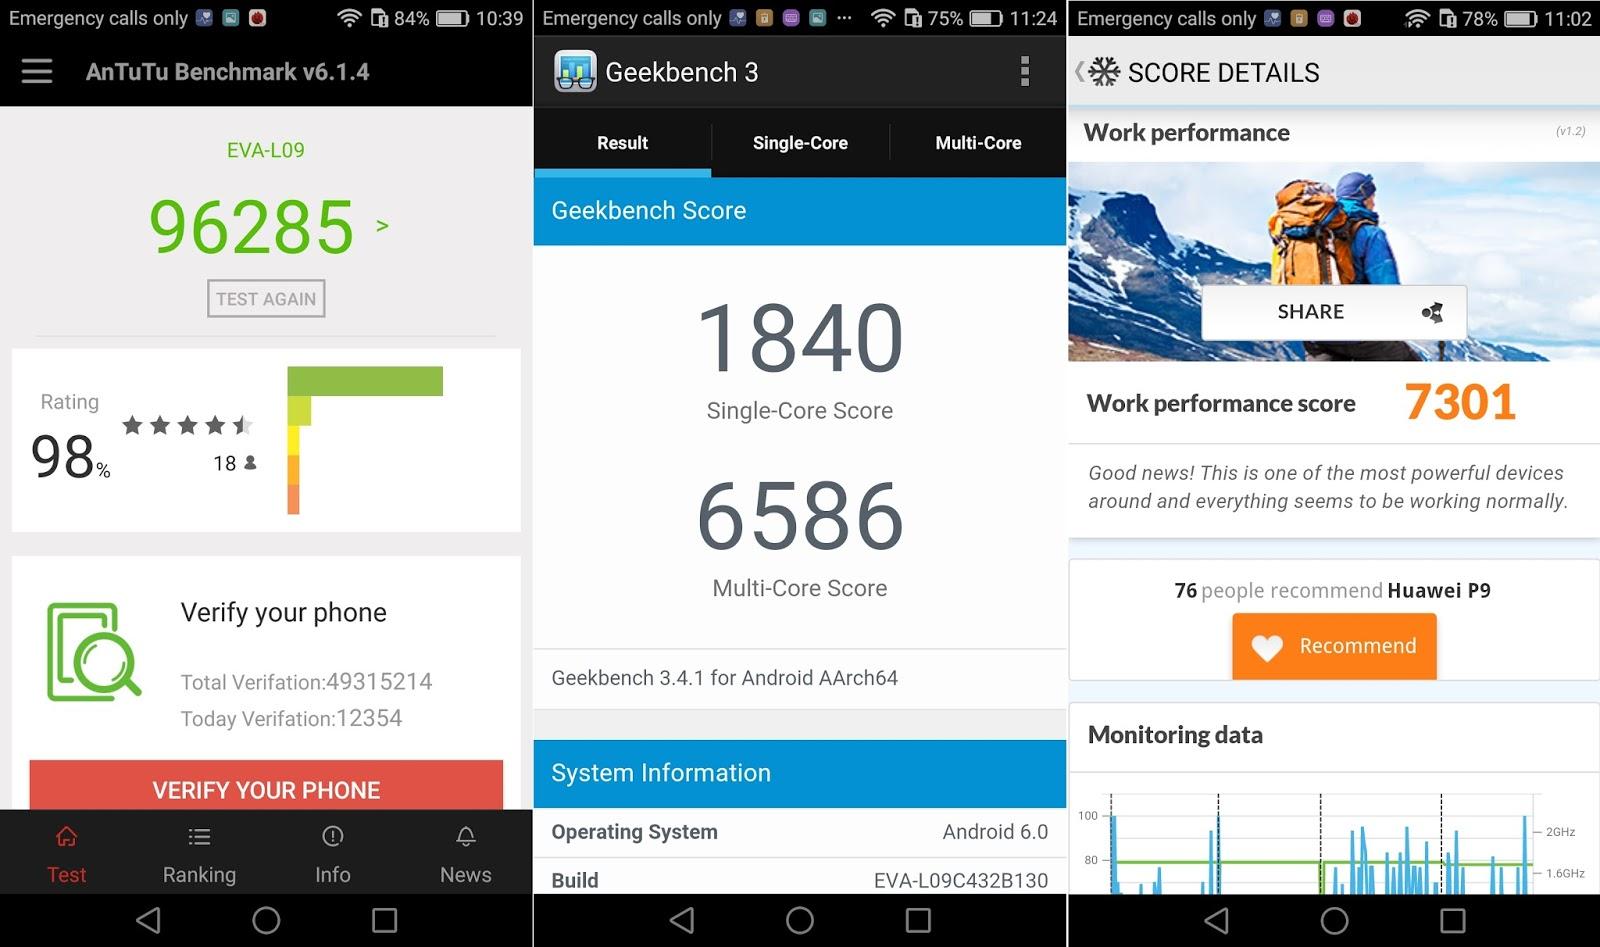 Huawei P9 Benchmark Scores